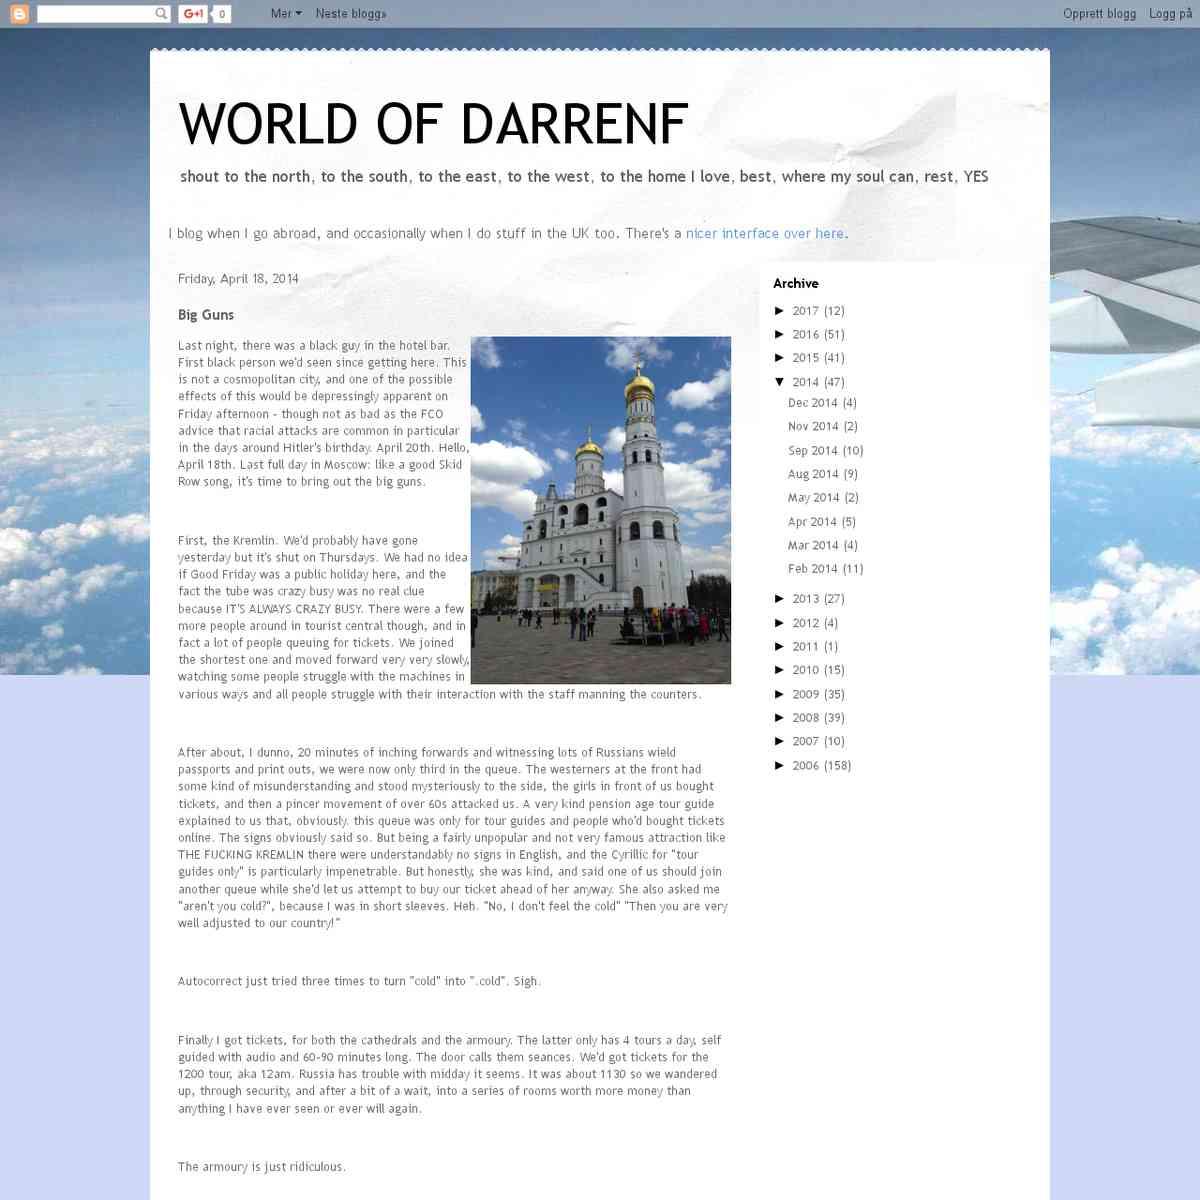 blog.darrenf.org/2014/04/big-guns.html